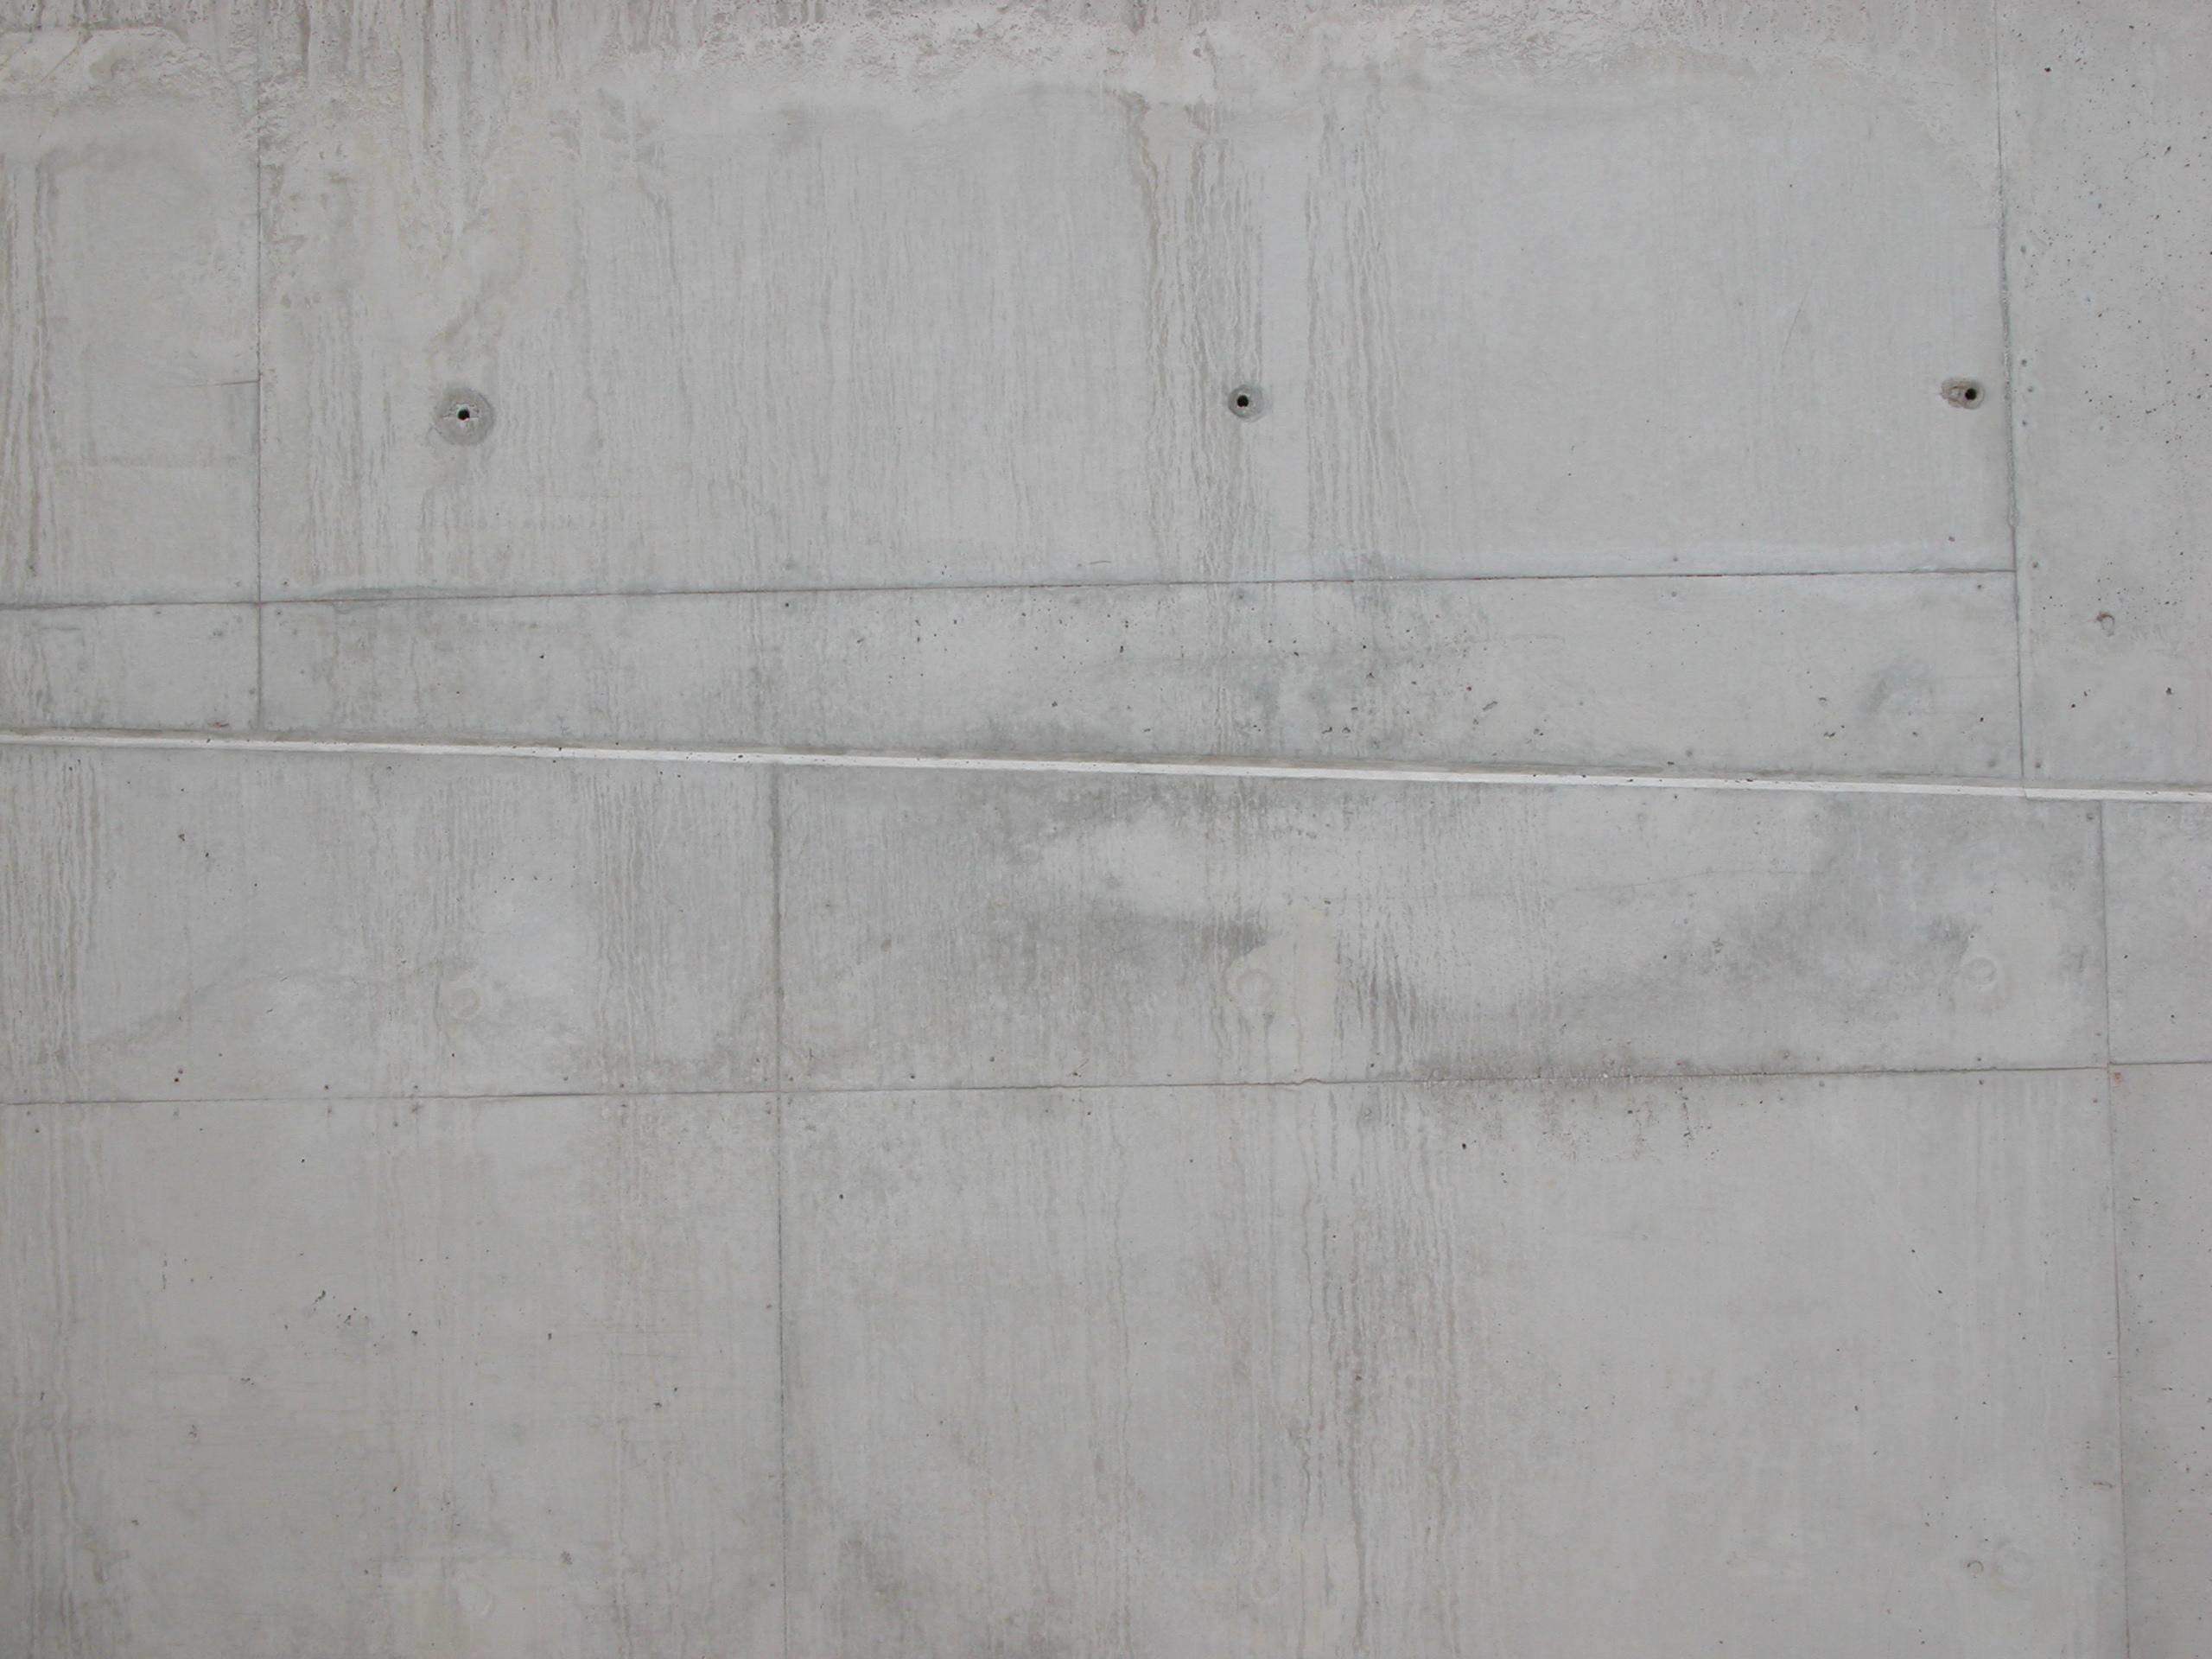 concrete wall holes grey gray